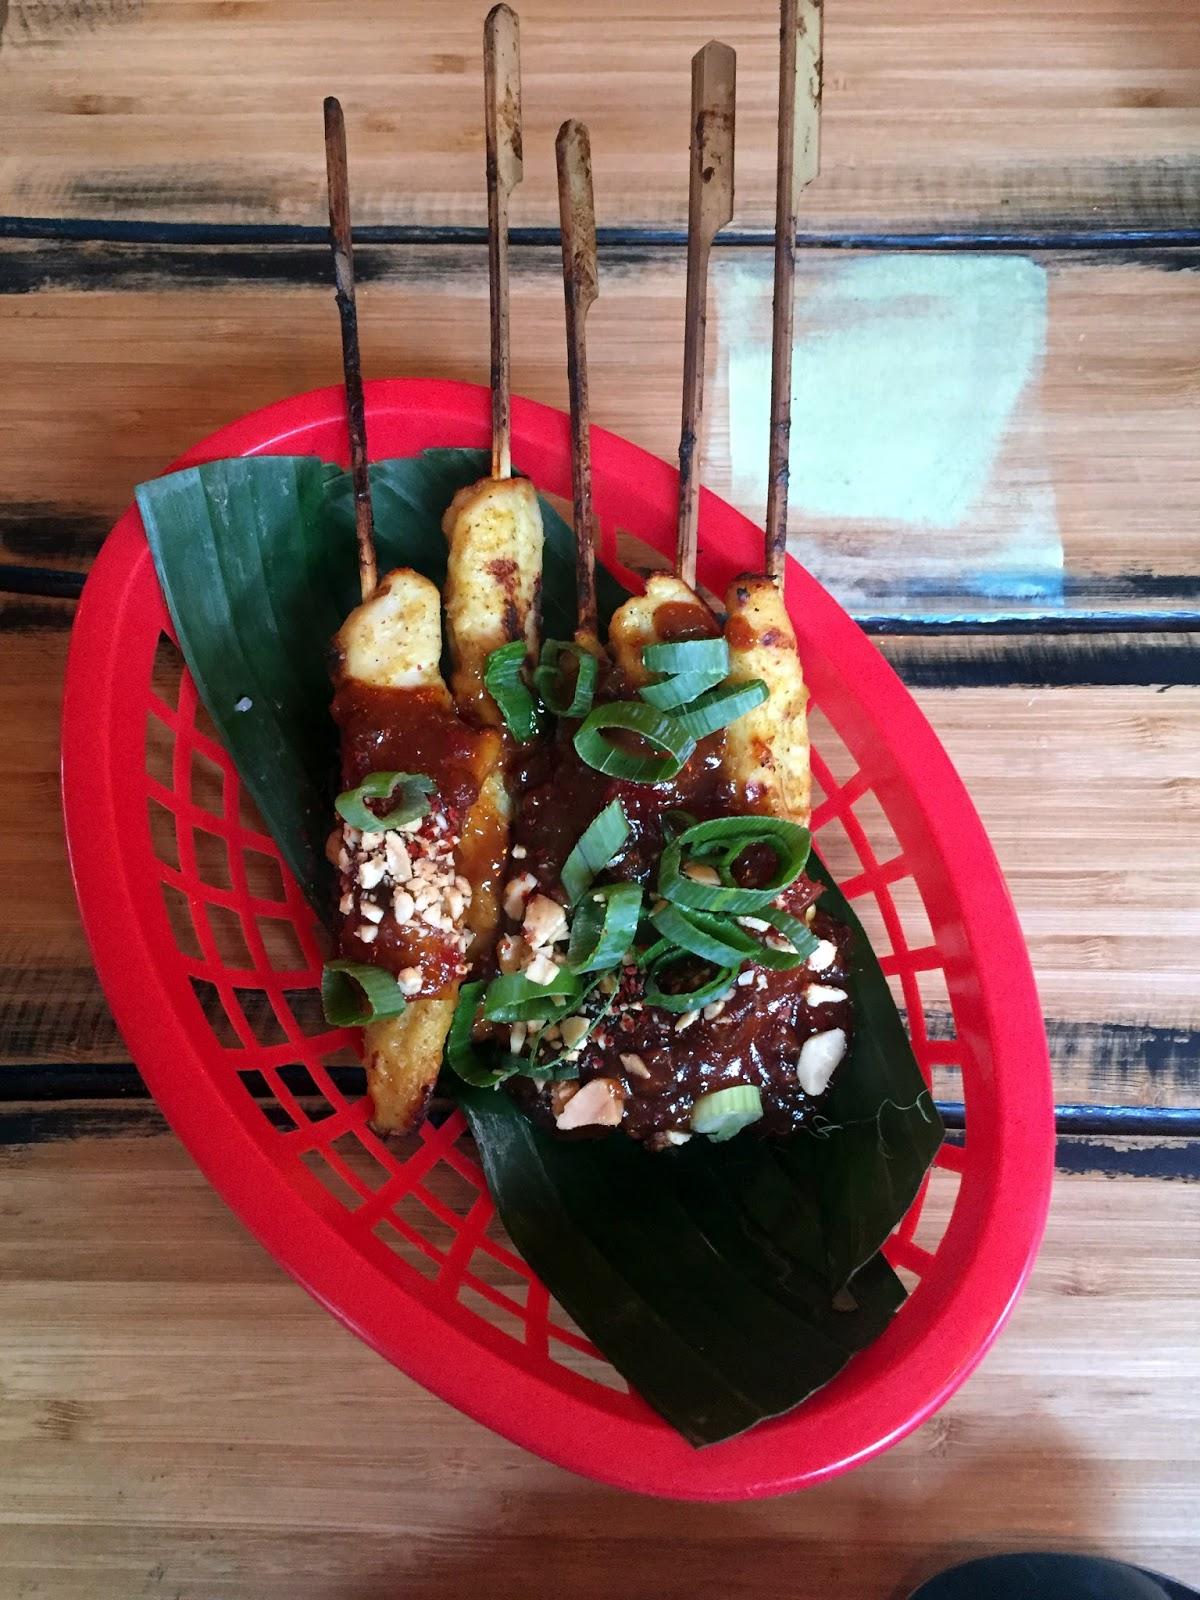 Stitch & Bear - Soi74 Thai Food Cafe - lemongrass chicken satay skewers